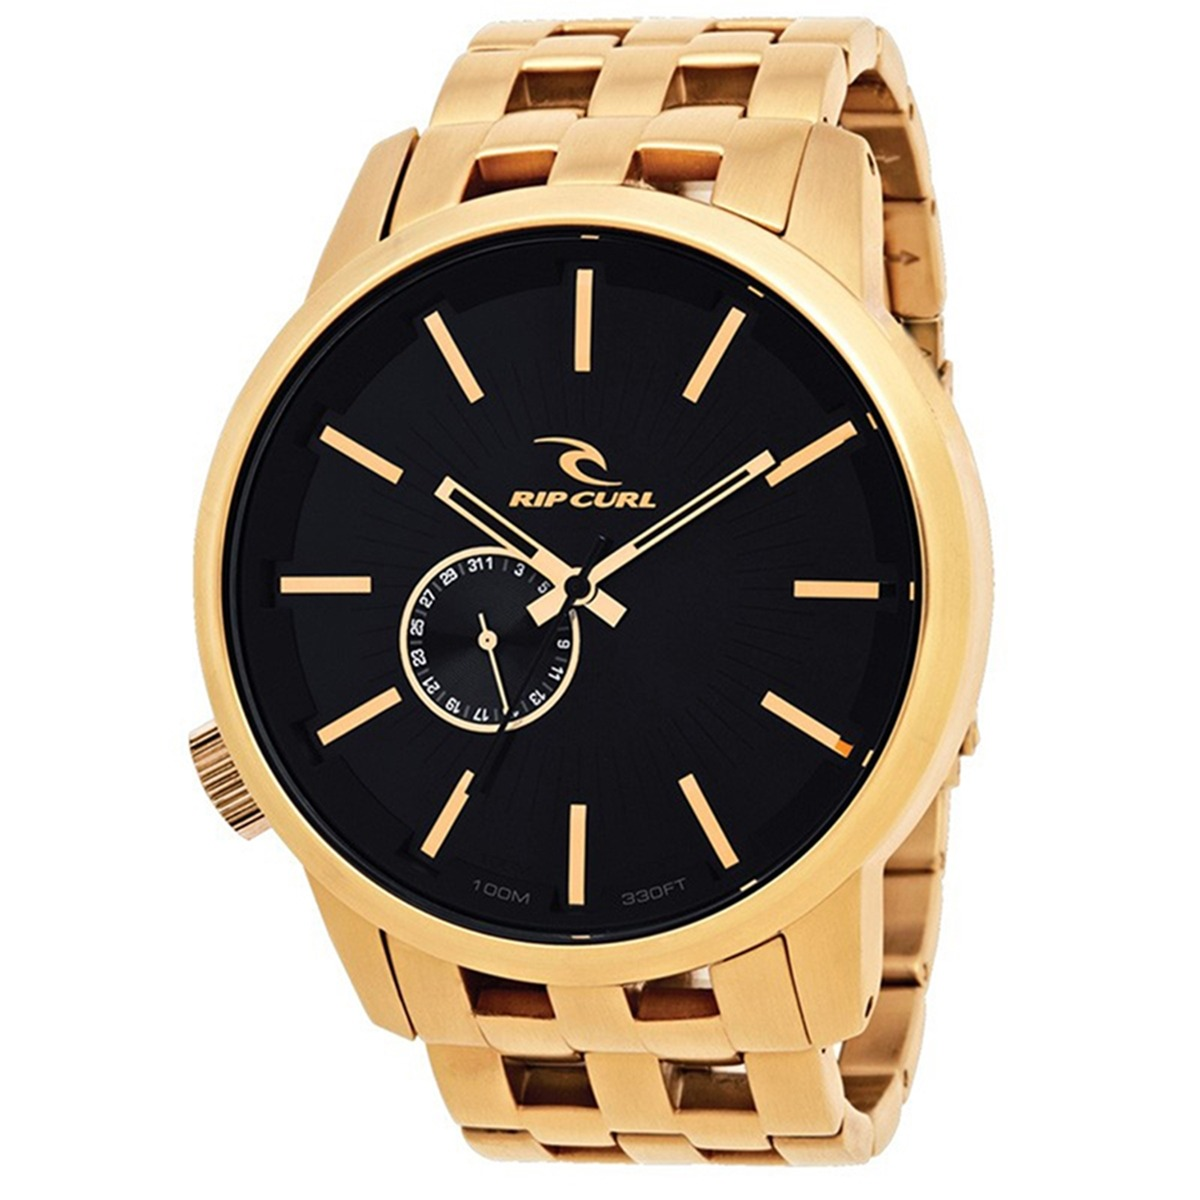 c8230ee82 Relógio Rip Curl Detroit Gold Sss - R  1.599